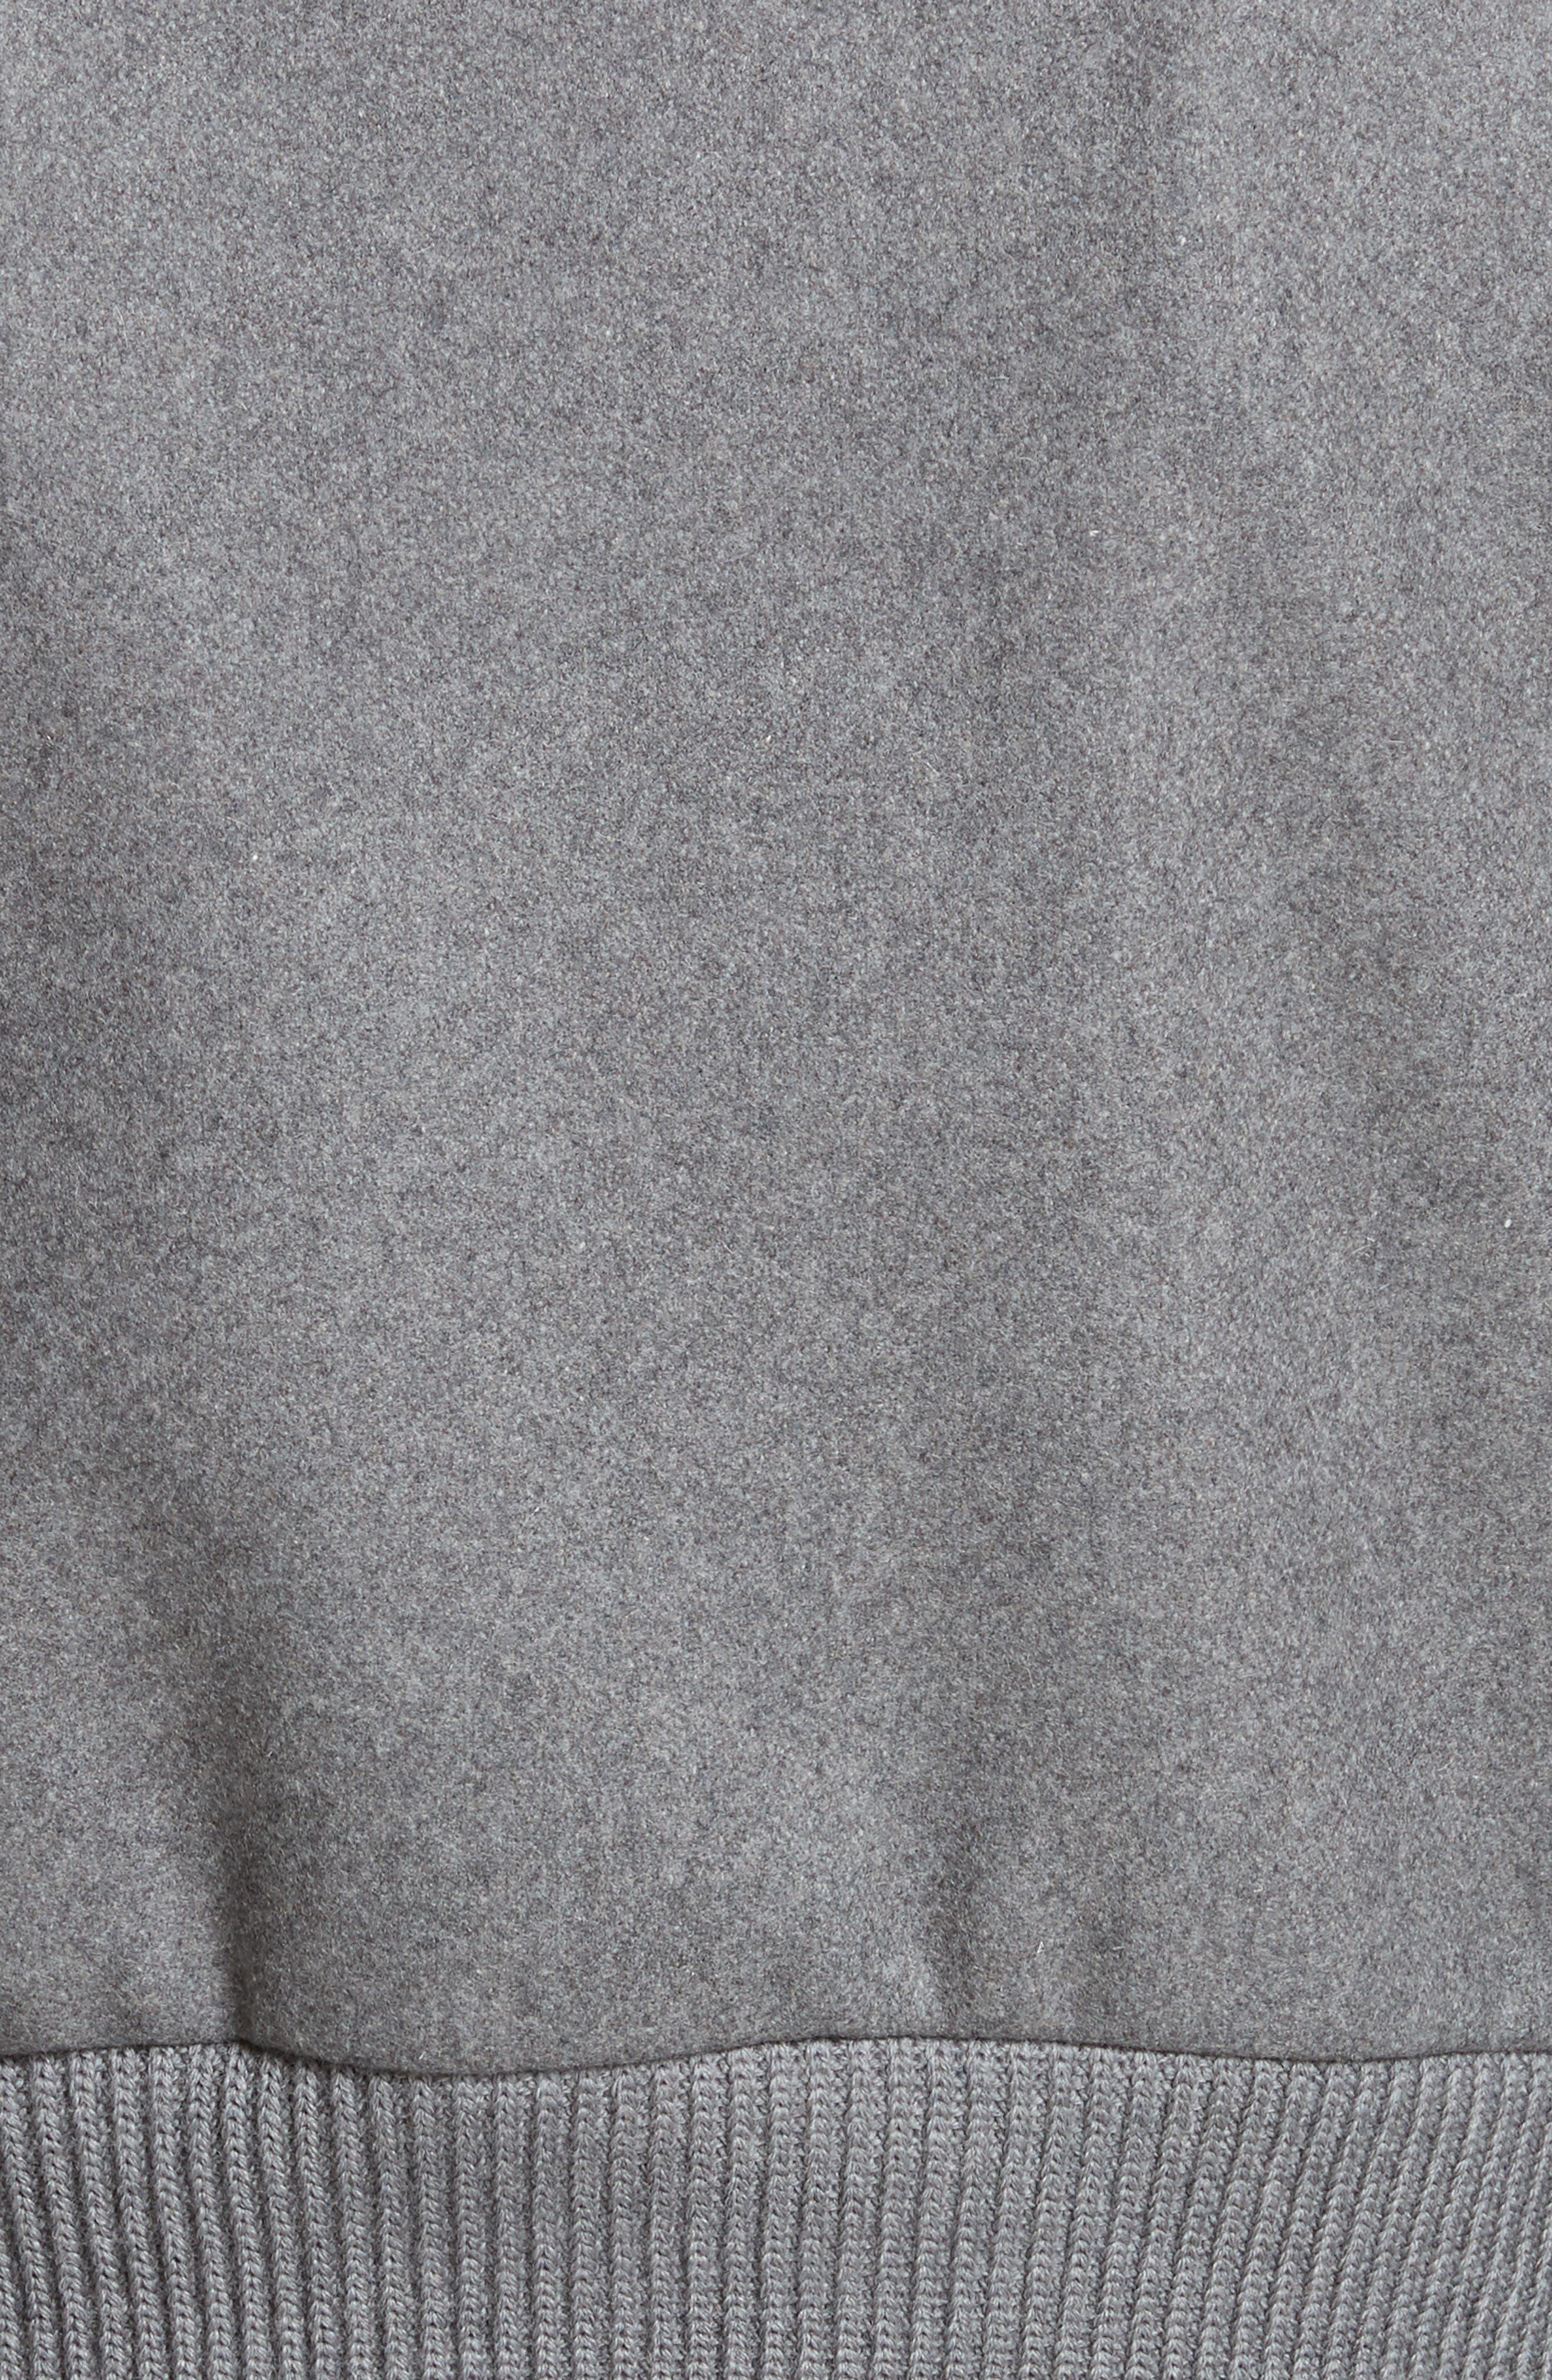 Mélange Wool Blend Jacket,                             Alternate thumbnail 5, color,                             Ardesia